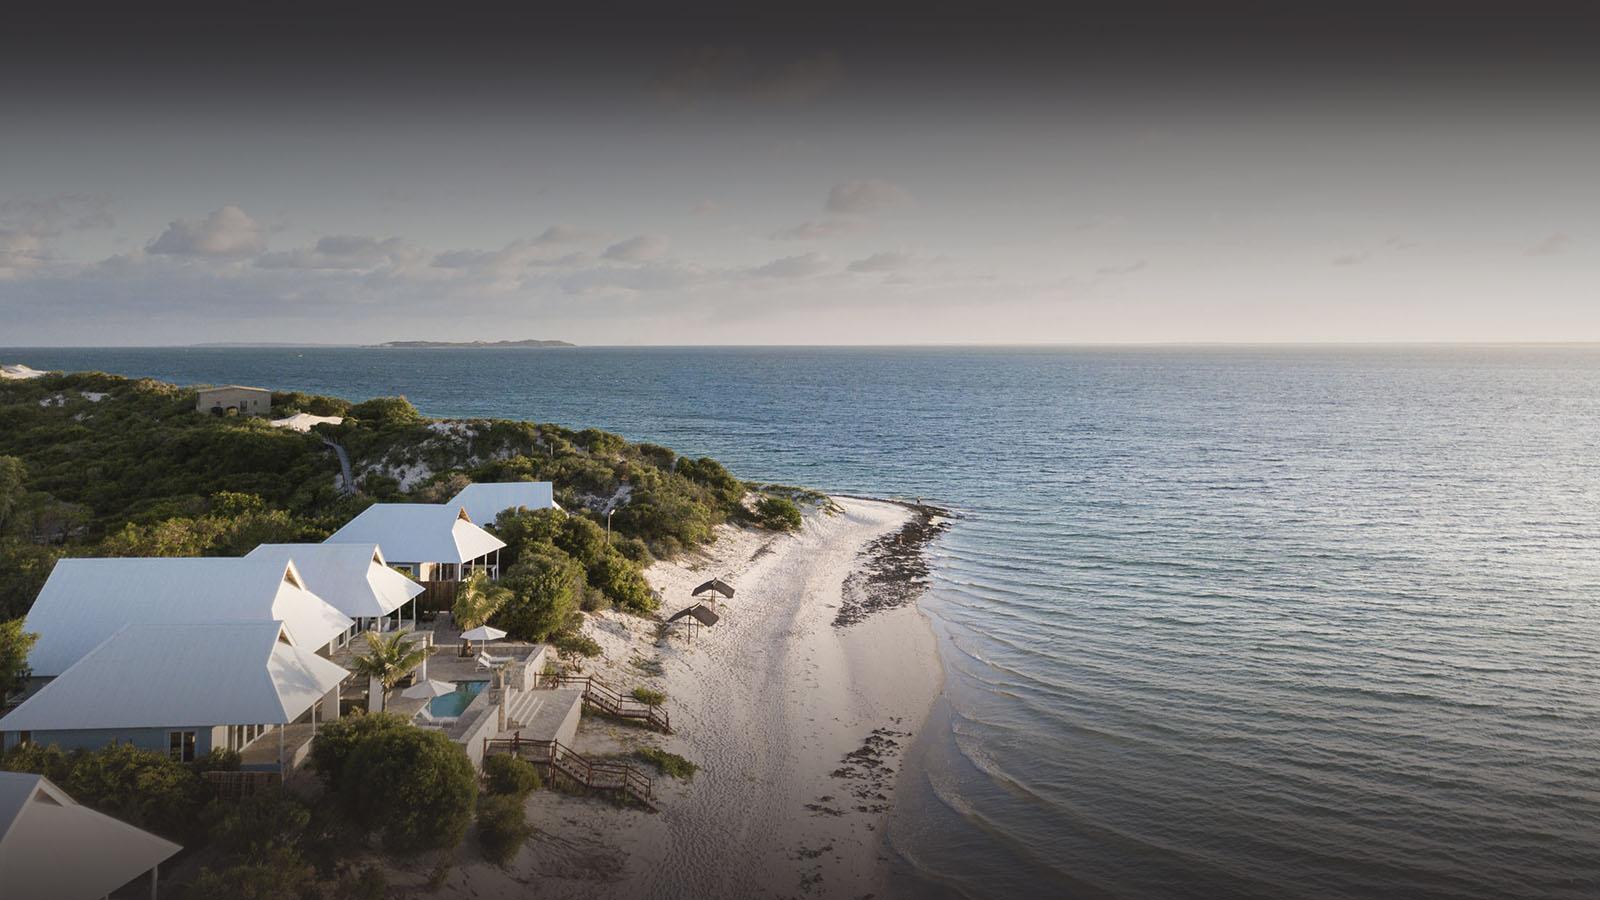 azura marlin beach benguerra-island-mozambique-lodges-zambia-in-style-ultimate-luxury-beaches